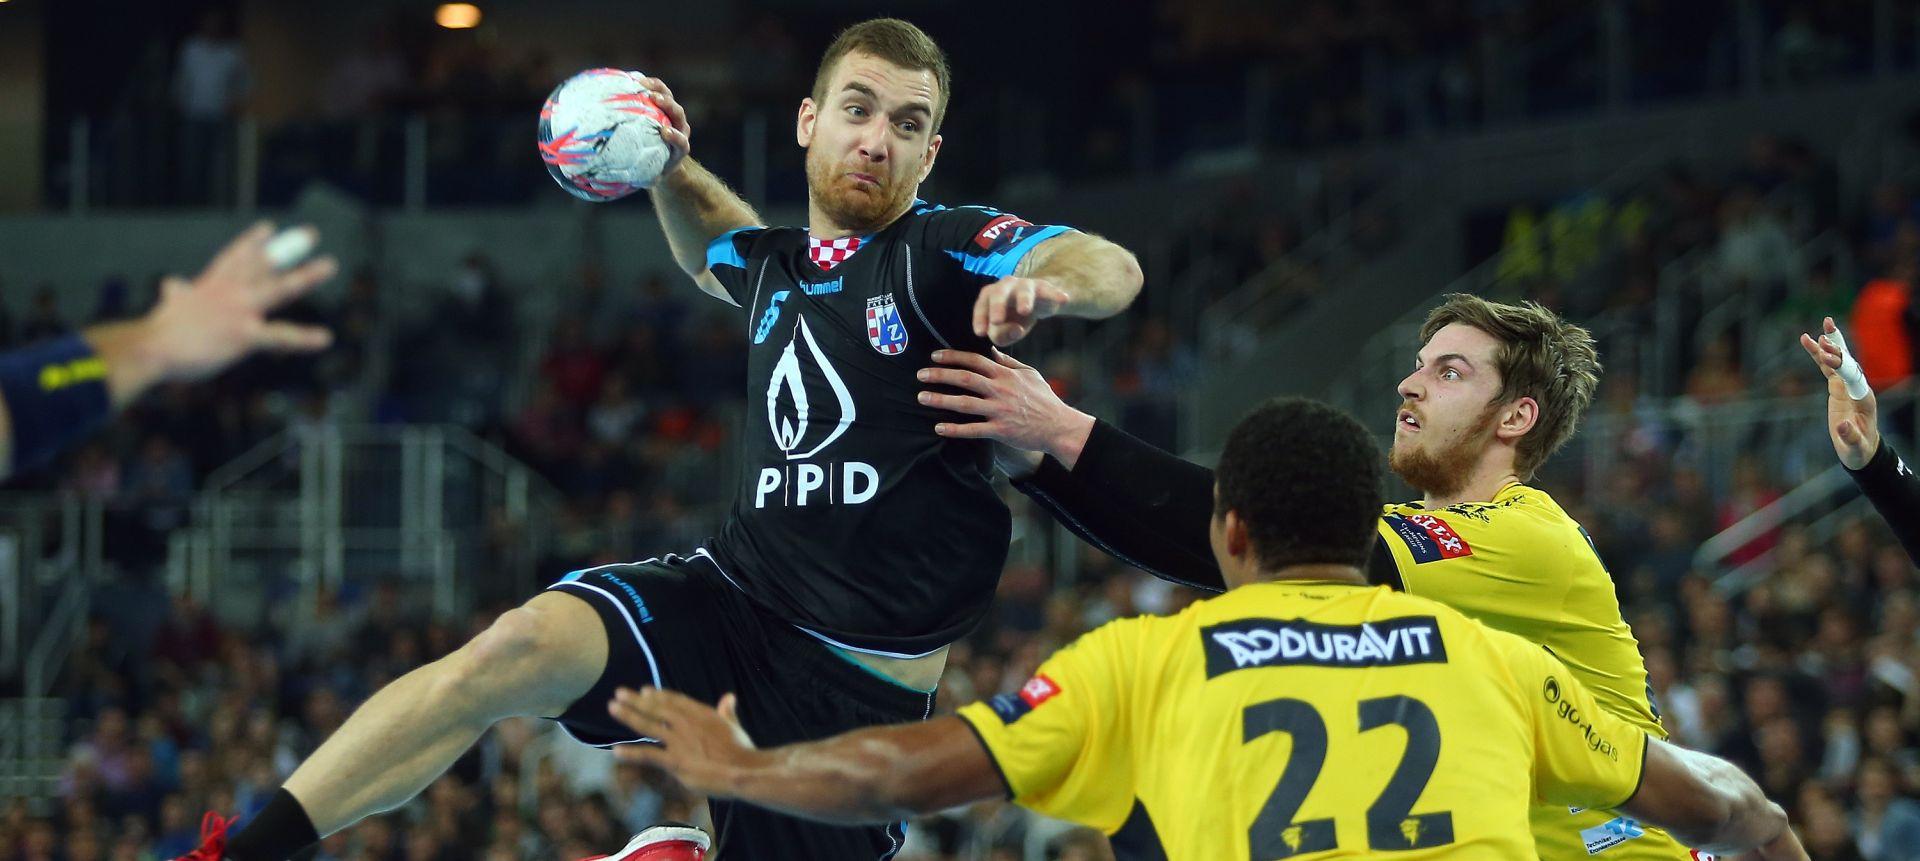 VIDEO: EHF Stefan Vujić i Denis Buntić u idealnoj momčadi kola, Stevanović u Top 5 najboljih obrana